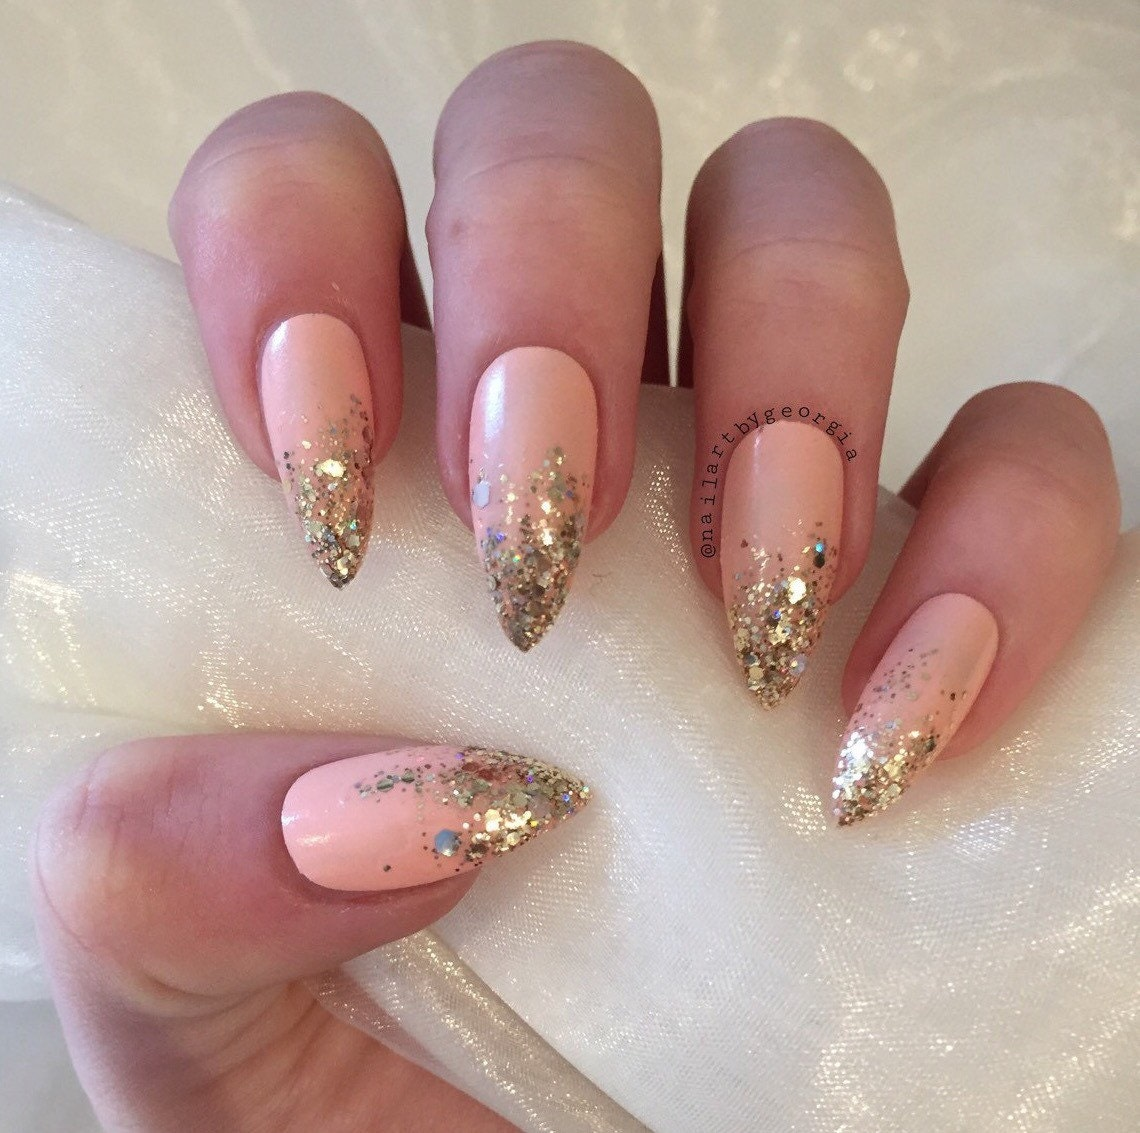 peach stiletto false nails with gold glitter ombre